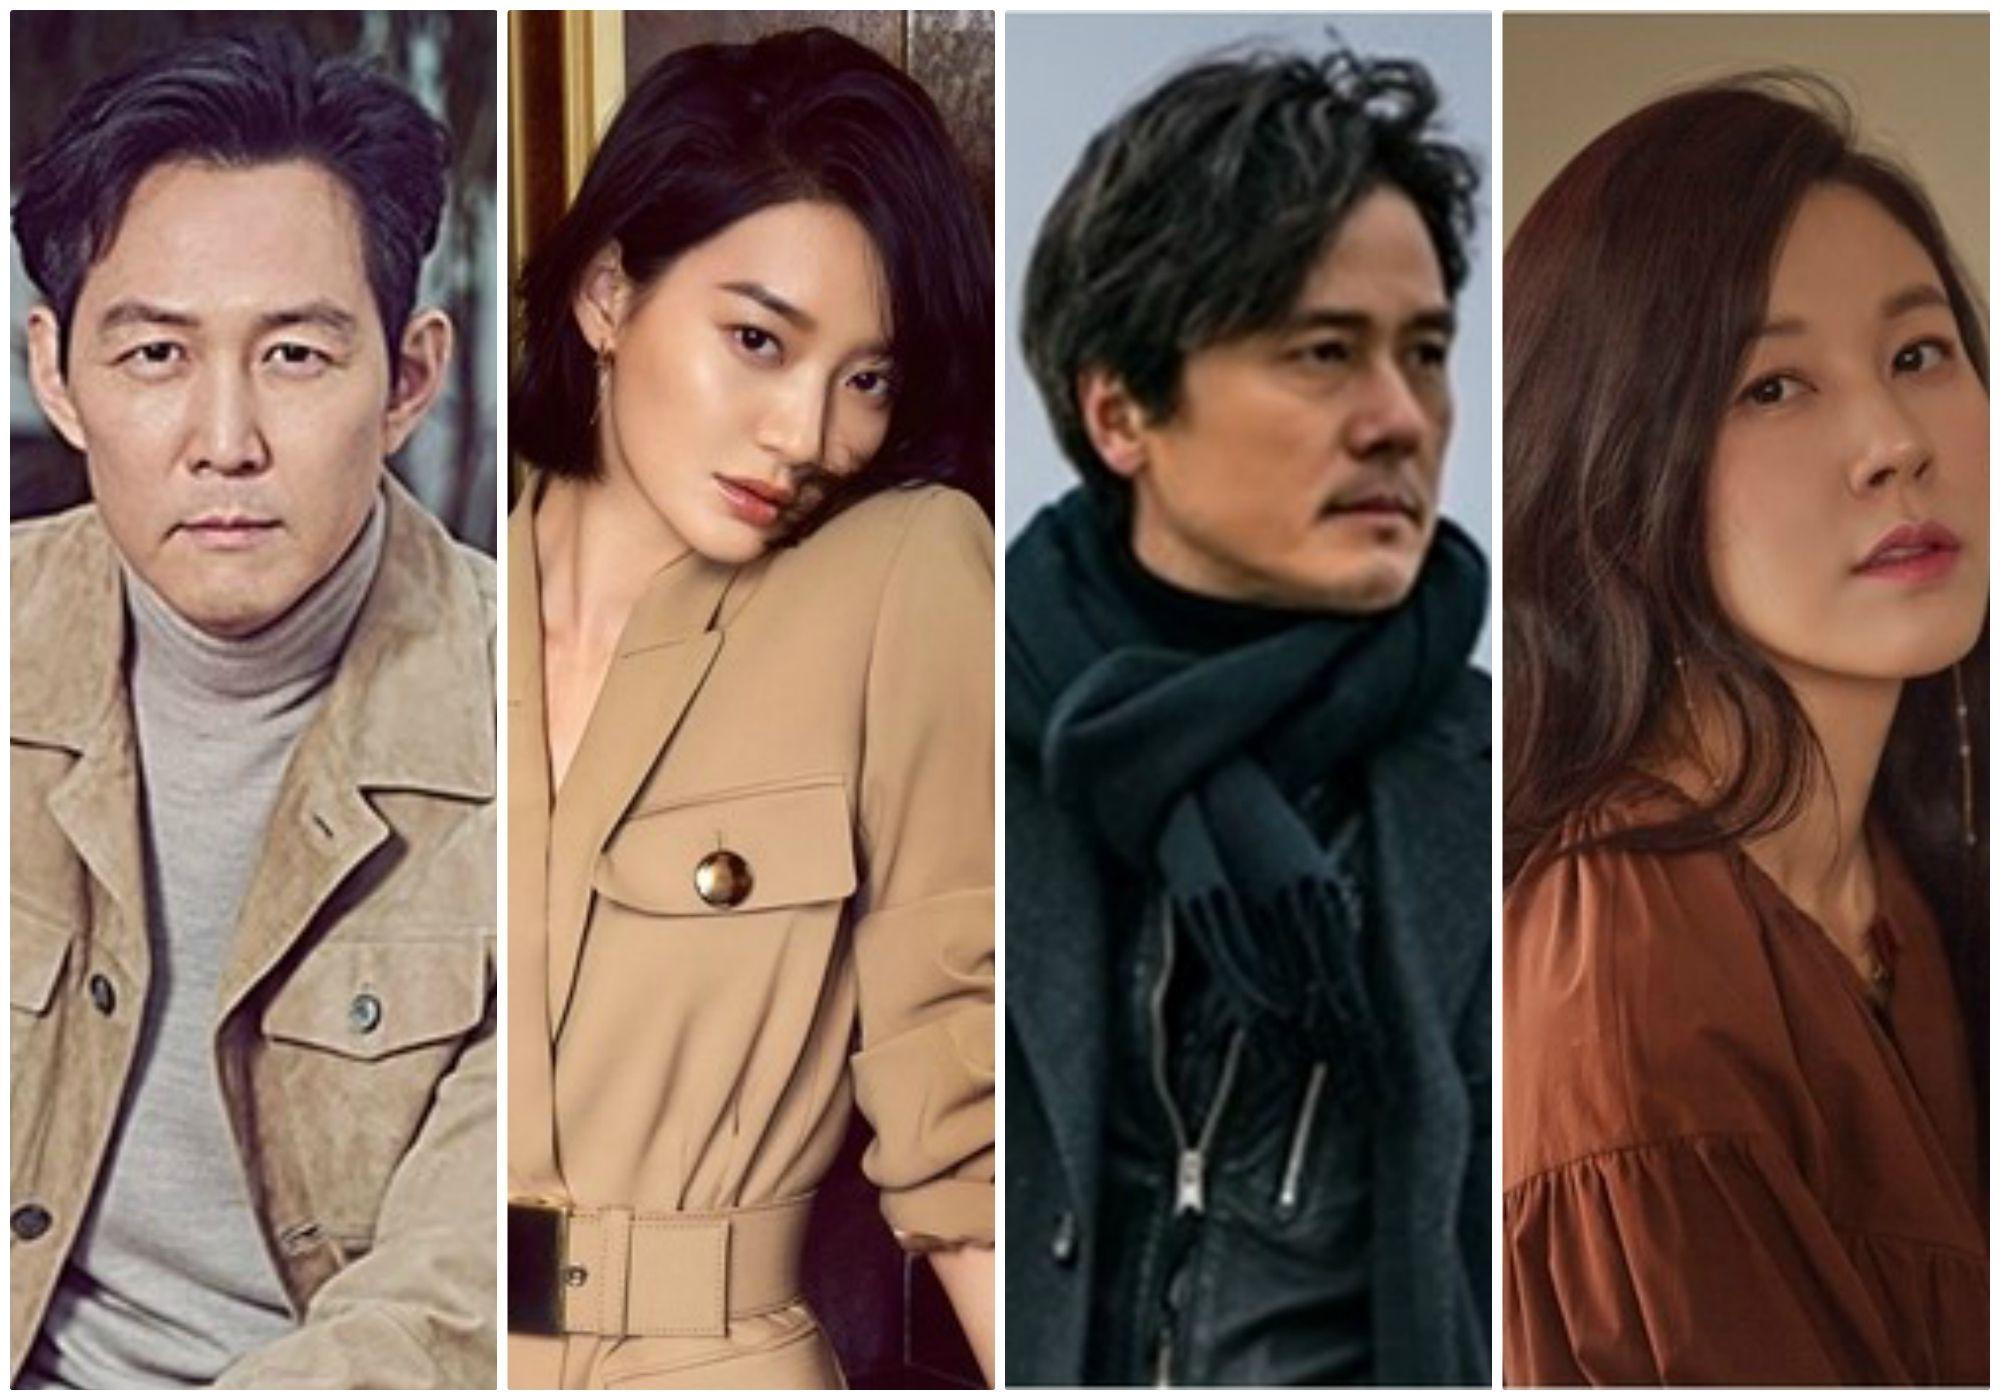 "Couple ""Jae Woo Sung x Kim Ha Eun"" or ""Lee Jung Jae x Shin Min Ah"" get new line-up JTBC's drama on this May"